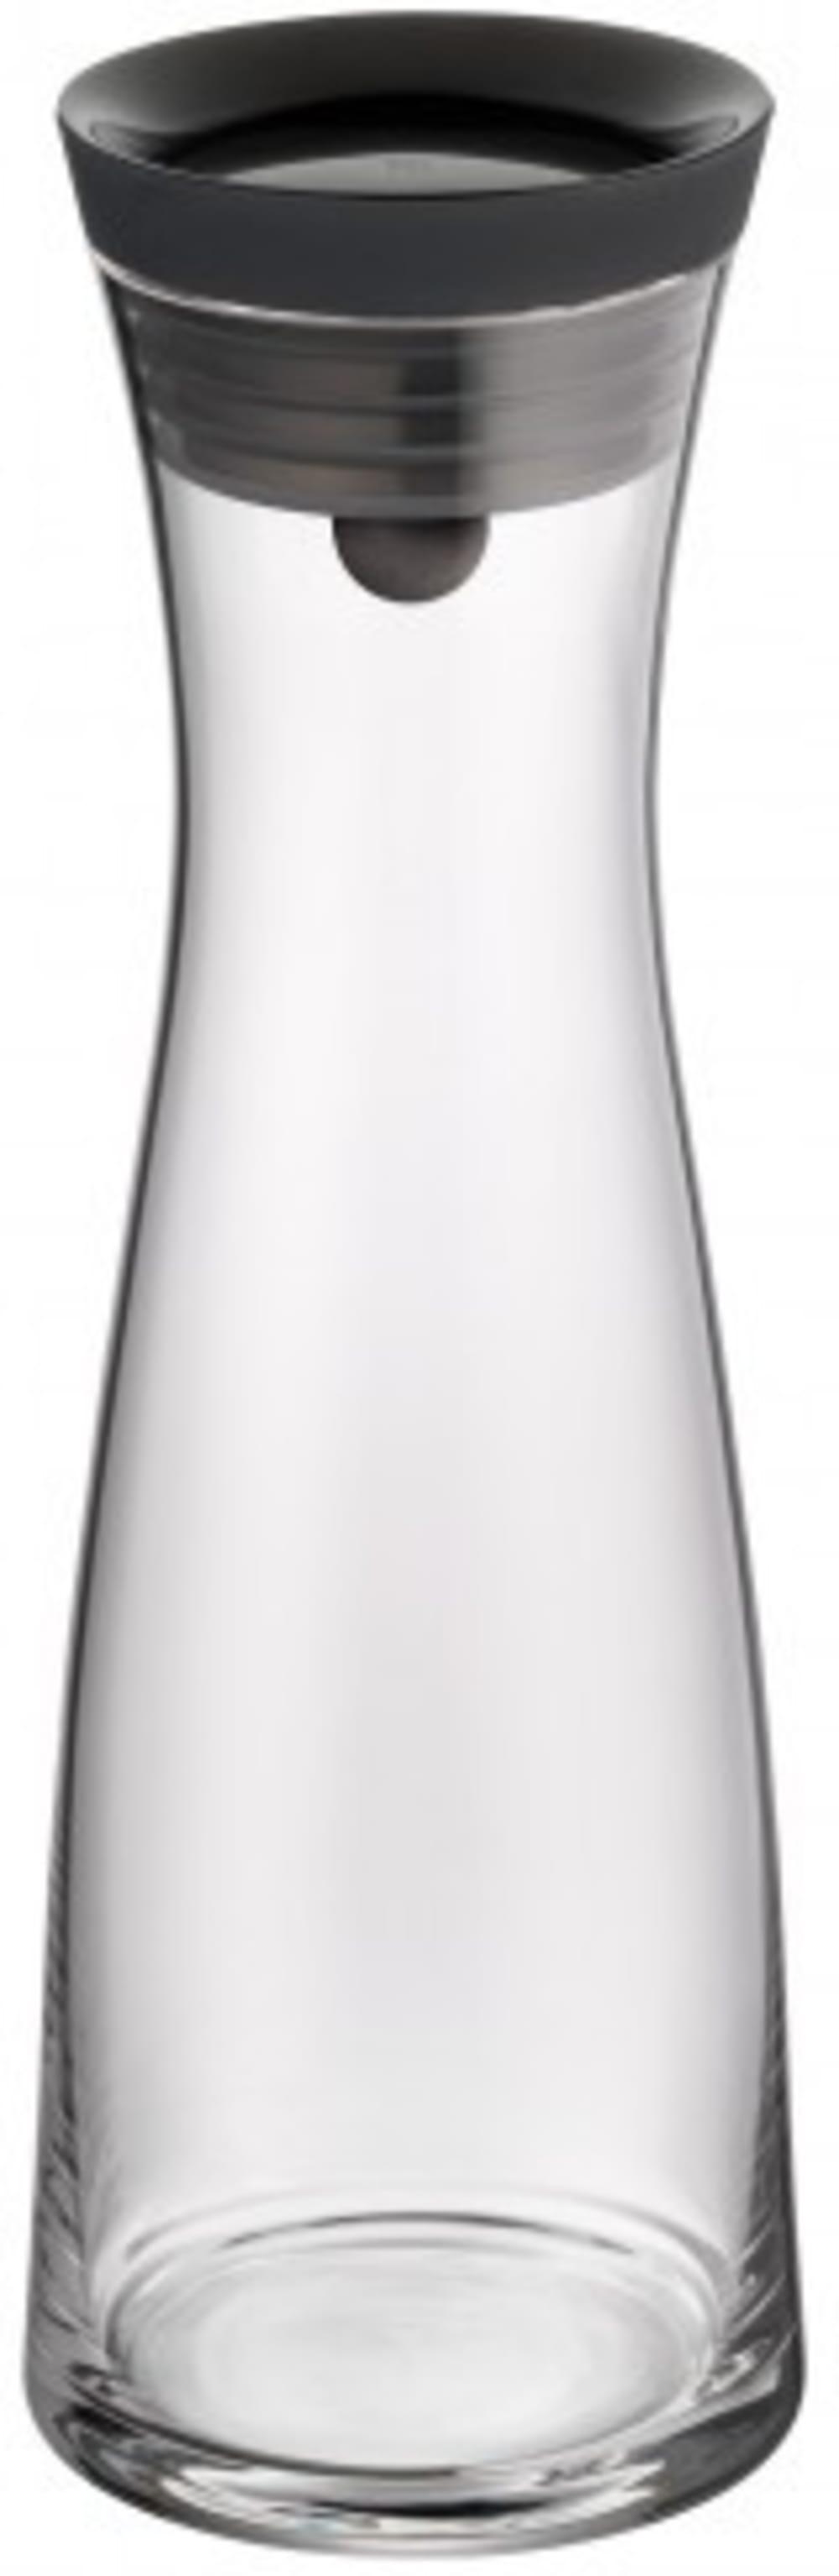 Karafka do wody 1l, Basic WMF